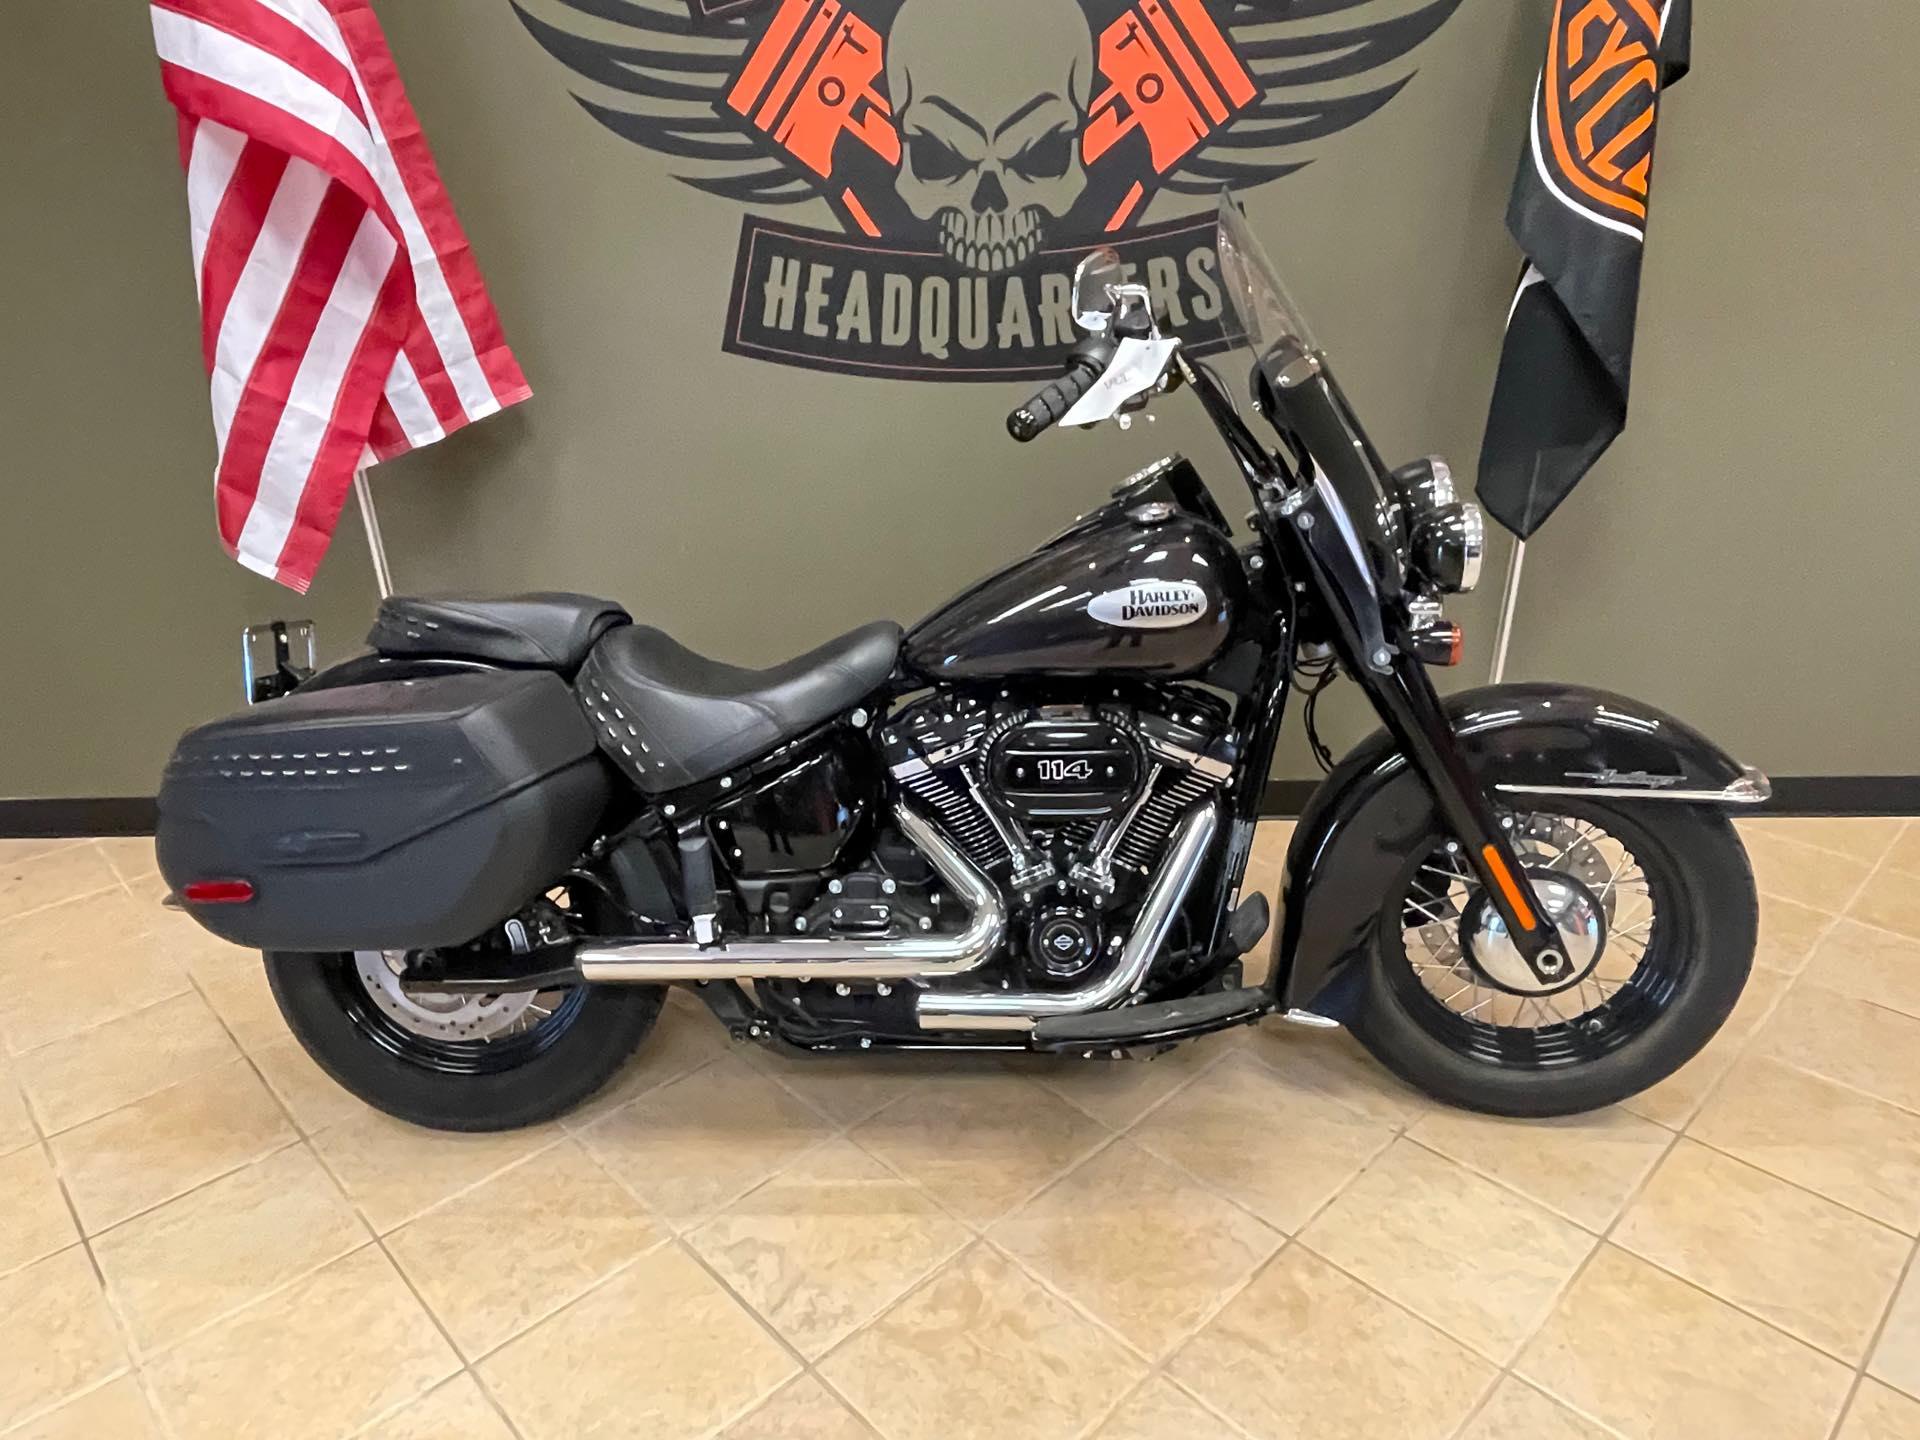 2021 Harley-Davidson Cruiser Heritage Classic S at Loess Hills Harley-Davidson